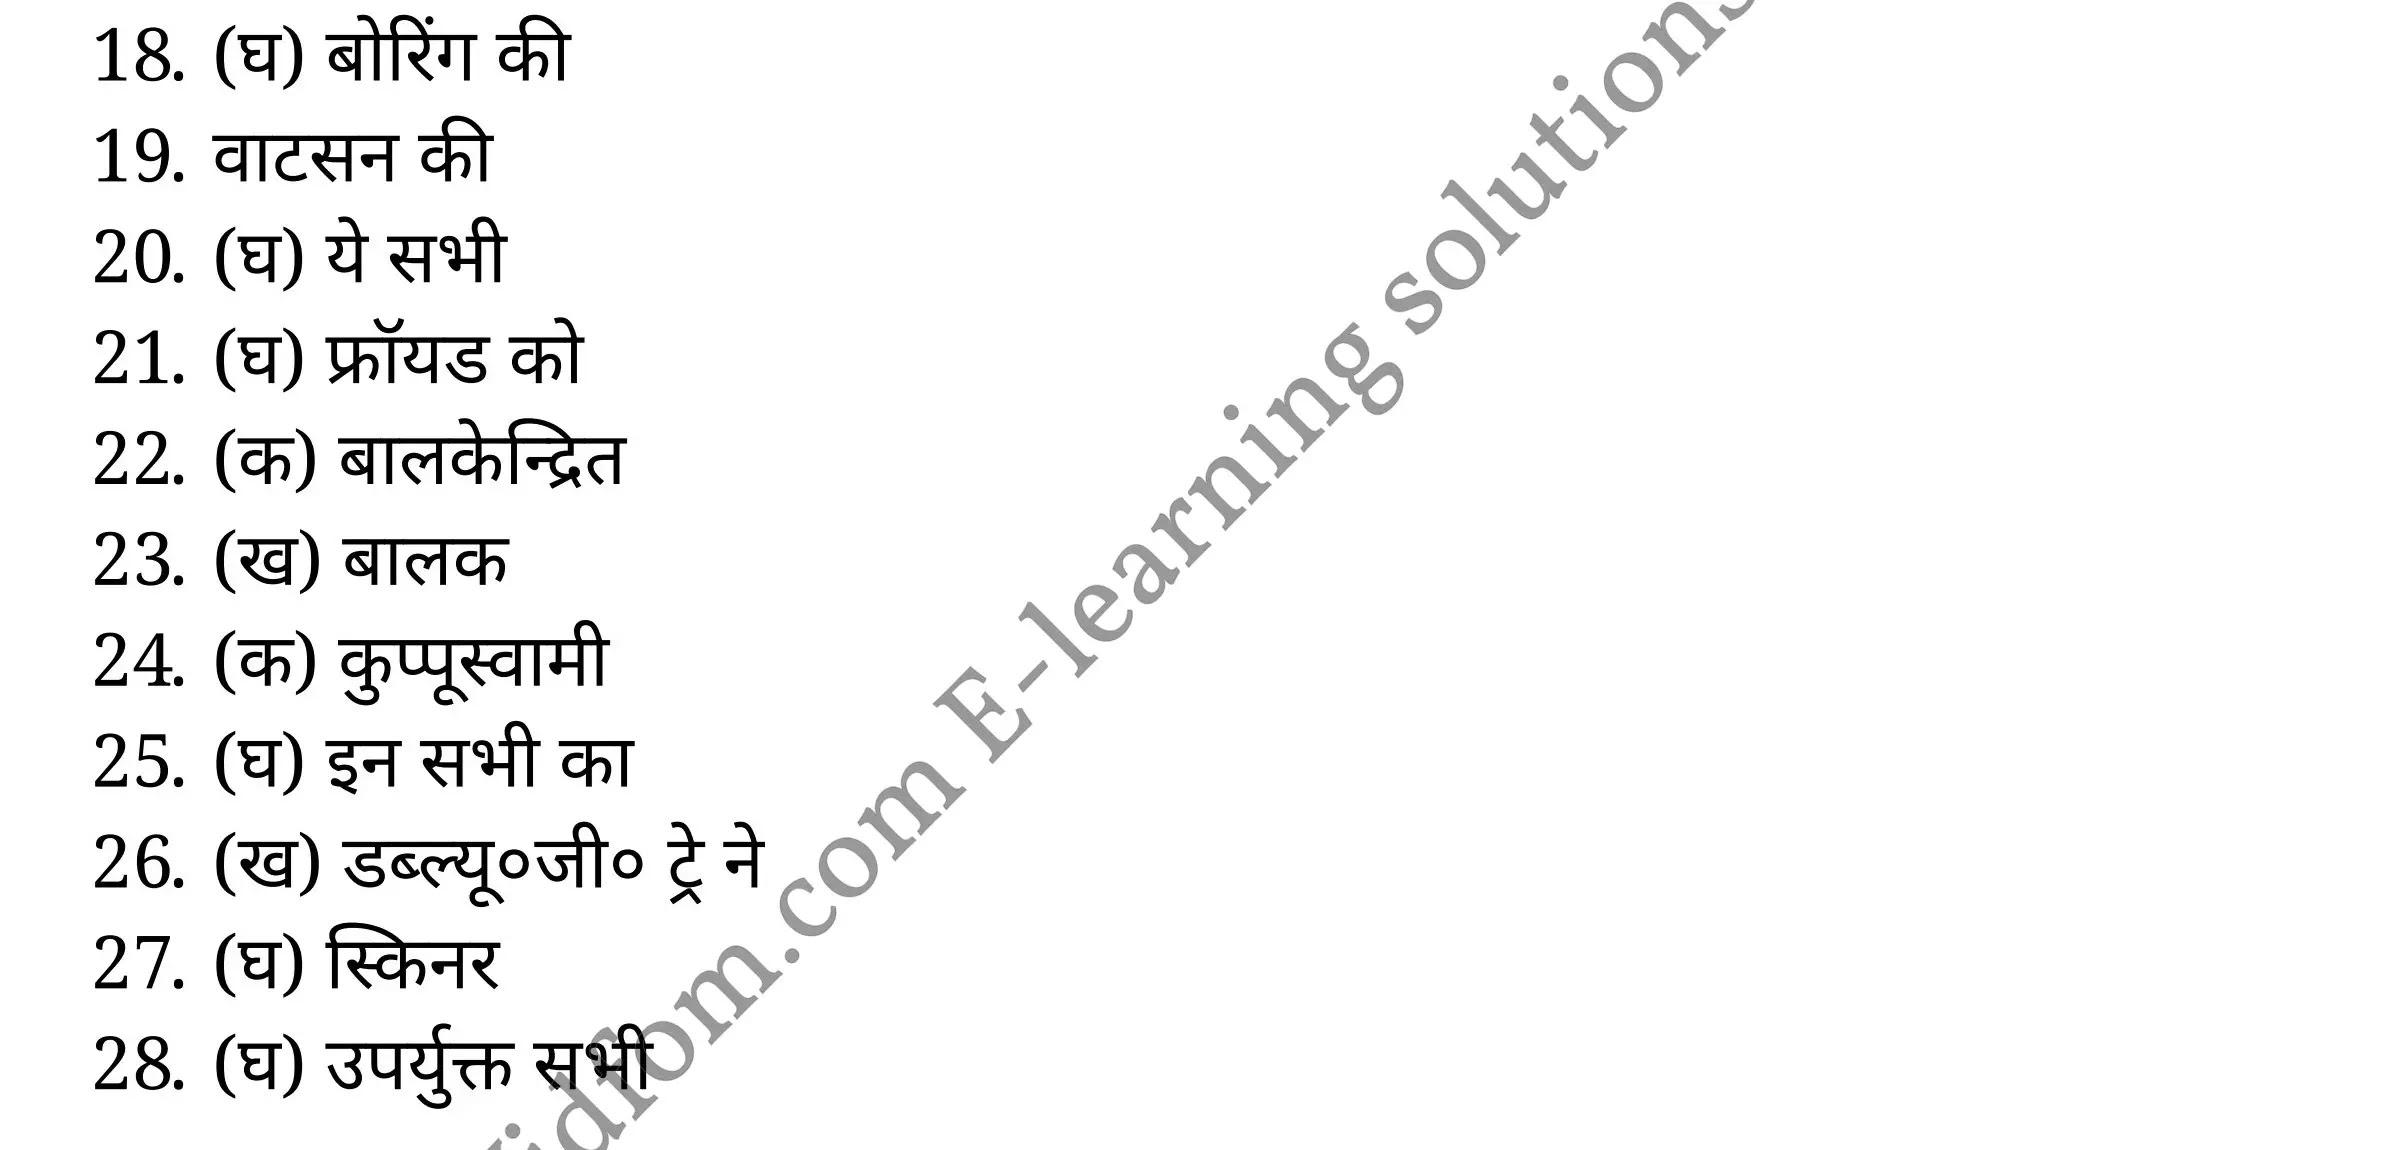 कक्षा 11 शिक्षाशास्त्र के नोट्स हिंदी में एनसीईआरटी समाधान, class 11 Pedagogy chapter 16, class 11 Pedagogy chapter 16 ncert solutions in Pedagogy, class 11 Pedagogy chapter 16 notes in hindi, class 11 Pedagogy chapter 16 question answer, class 11 Pedagogy chapter 16 notes, class 11 Pedagogy chapter 16 class 11 Pedagogy chapter 16 in hindi, class 11 Pedagogy chapter 16 important questions in hindi, class 11 Pedagogy hindi chapter 16 notes in hindi, class 11 Pedagogy chapter 16 test, class 11 Pedagogy chapter 16 class 11 Pedagogy chapter 16 pdf, class 11 Pedagogy chapter 16 notes pdf, class 11 Pedagogy chapter 16 exercise solutions, class 11 Pedagogy chapter 16, class 11 Pedagogy chapter 16 notes study rankers, class 11 Pedagogy chapter 16 notes, class 11 Pedagogy hindi chapter 16 notes, class 11 Pedagogy chapter 16 class 11 notes pdf, class 11 Pedagogy chapter 16 class 11 notes ncert, class 11 Pedagogy chapter 16 class 11 pdf, class 11 Pedagogy chapter 16 book, class 11 Pedagogy chapter 16 quiz class 11 , 11 th class 11 Pedagogy chapter 16 book up board, up board 11 th class 11 Pedagogy chapter 16 notes, class 11 Pedagogy, class 11 Pedagogy ncert solutions in Pedagogy, class 11 Pedagogy notes in hindi, class 11 Pedagogy question answer, class 11 Pedagogy notes, class 11 Pedagogy class 11 Pedagogy chapter 16 in hindi, class 11 Pedagogy important questions in hindi, class 11 Pedagogy notes in hindi, class 11 Pedagogy test, class 11 Pedagogy class 11 Pedagogy chapter 16 pdf, class 11 Pedagogy notes pdf, class 11 Pedagogy exercise solutions, class 11 Pedagogy, class 11 Pedagogy notes study rankers, class 11 Pedagogy notes, class 11 Pedagogy notes, class 11 Pedagogy class 11 notes pdf, class 11 Pedagogy class 11 notes ncert, class 11 Pedagogy class 11 pdf, class 11 Pedagogy book, class 11 Pedagogy quiz class 11 , 11 th class 11 Pedagogy book up board, up board 11 th class 11 Pedagogy notes, कक्षा 11 शिक्षाशास्त्र अध्याय 16 , कक्षा 11 शिक्षाशास्त्र, कक्षा 11 शिक्षाशास्त्र